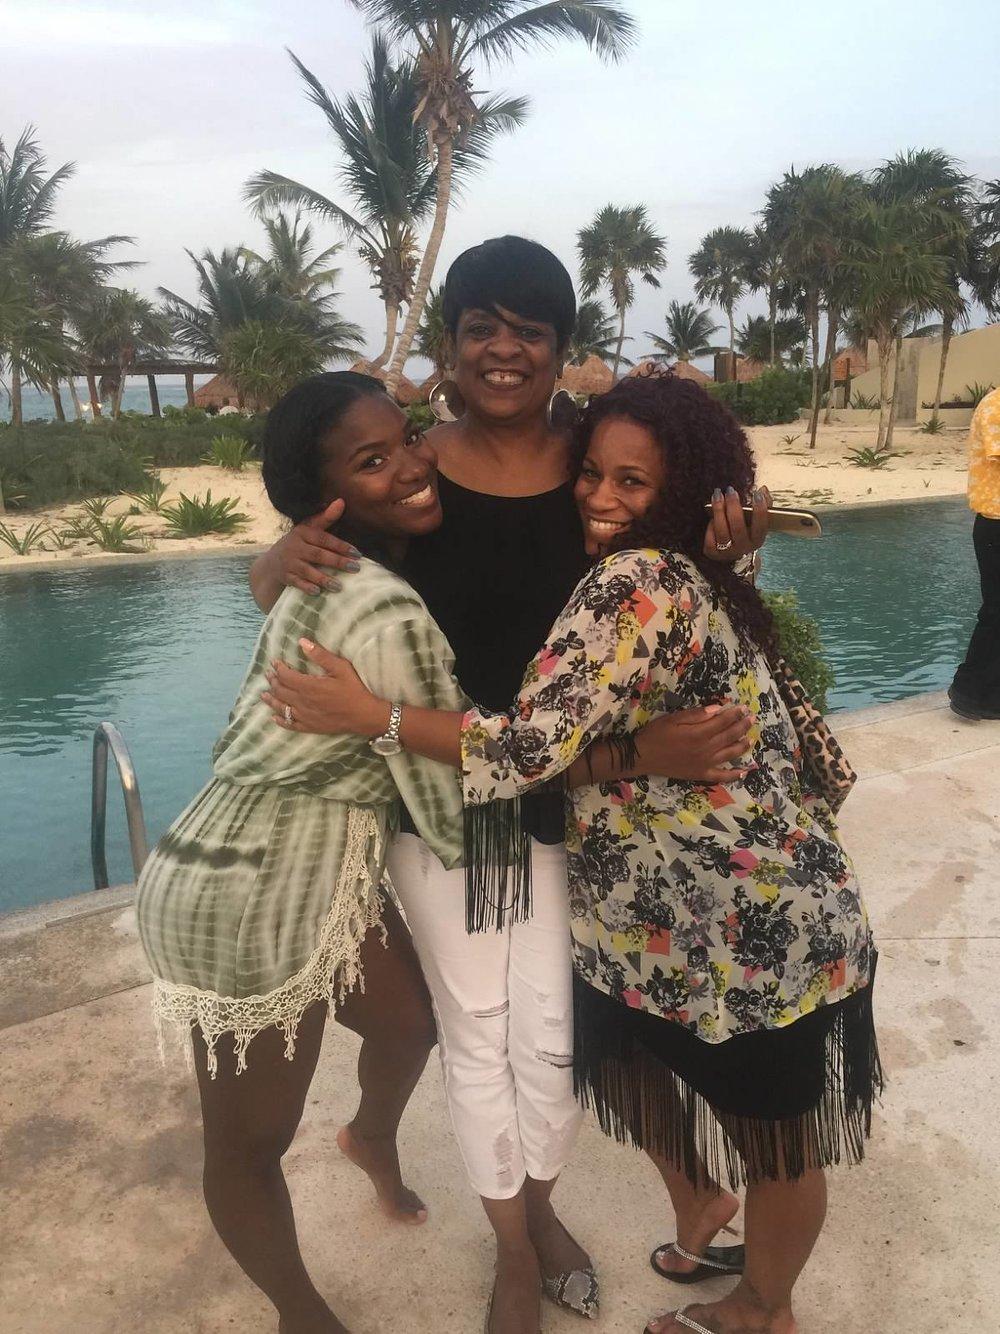 Black Destination Bride - BlackDesti Wedding Countdown Journal - Bridefriends Podcast - 3 Playa del Carmen Mexico - Secrets Maroma Welcome Pool13.jpeg